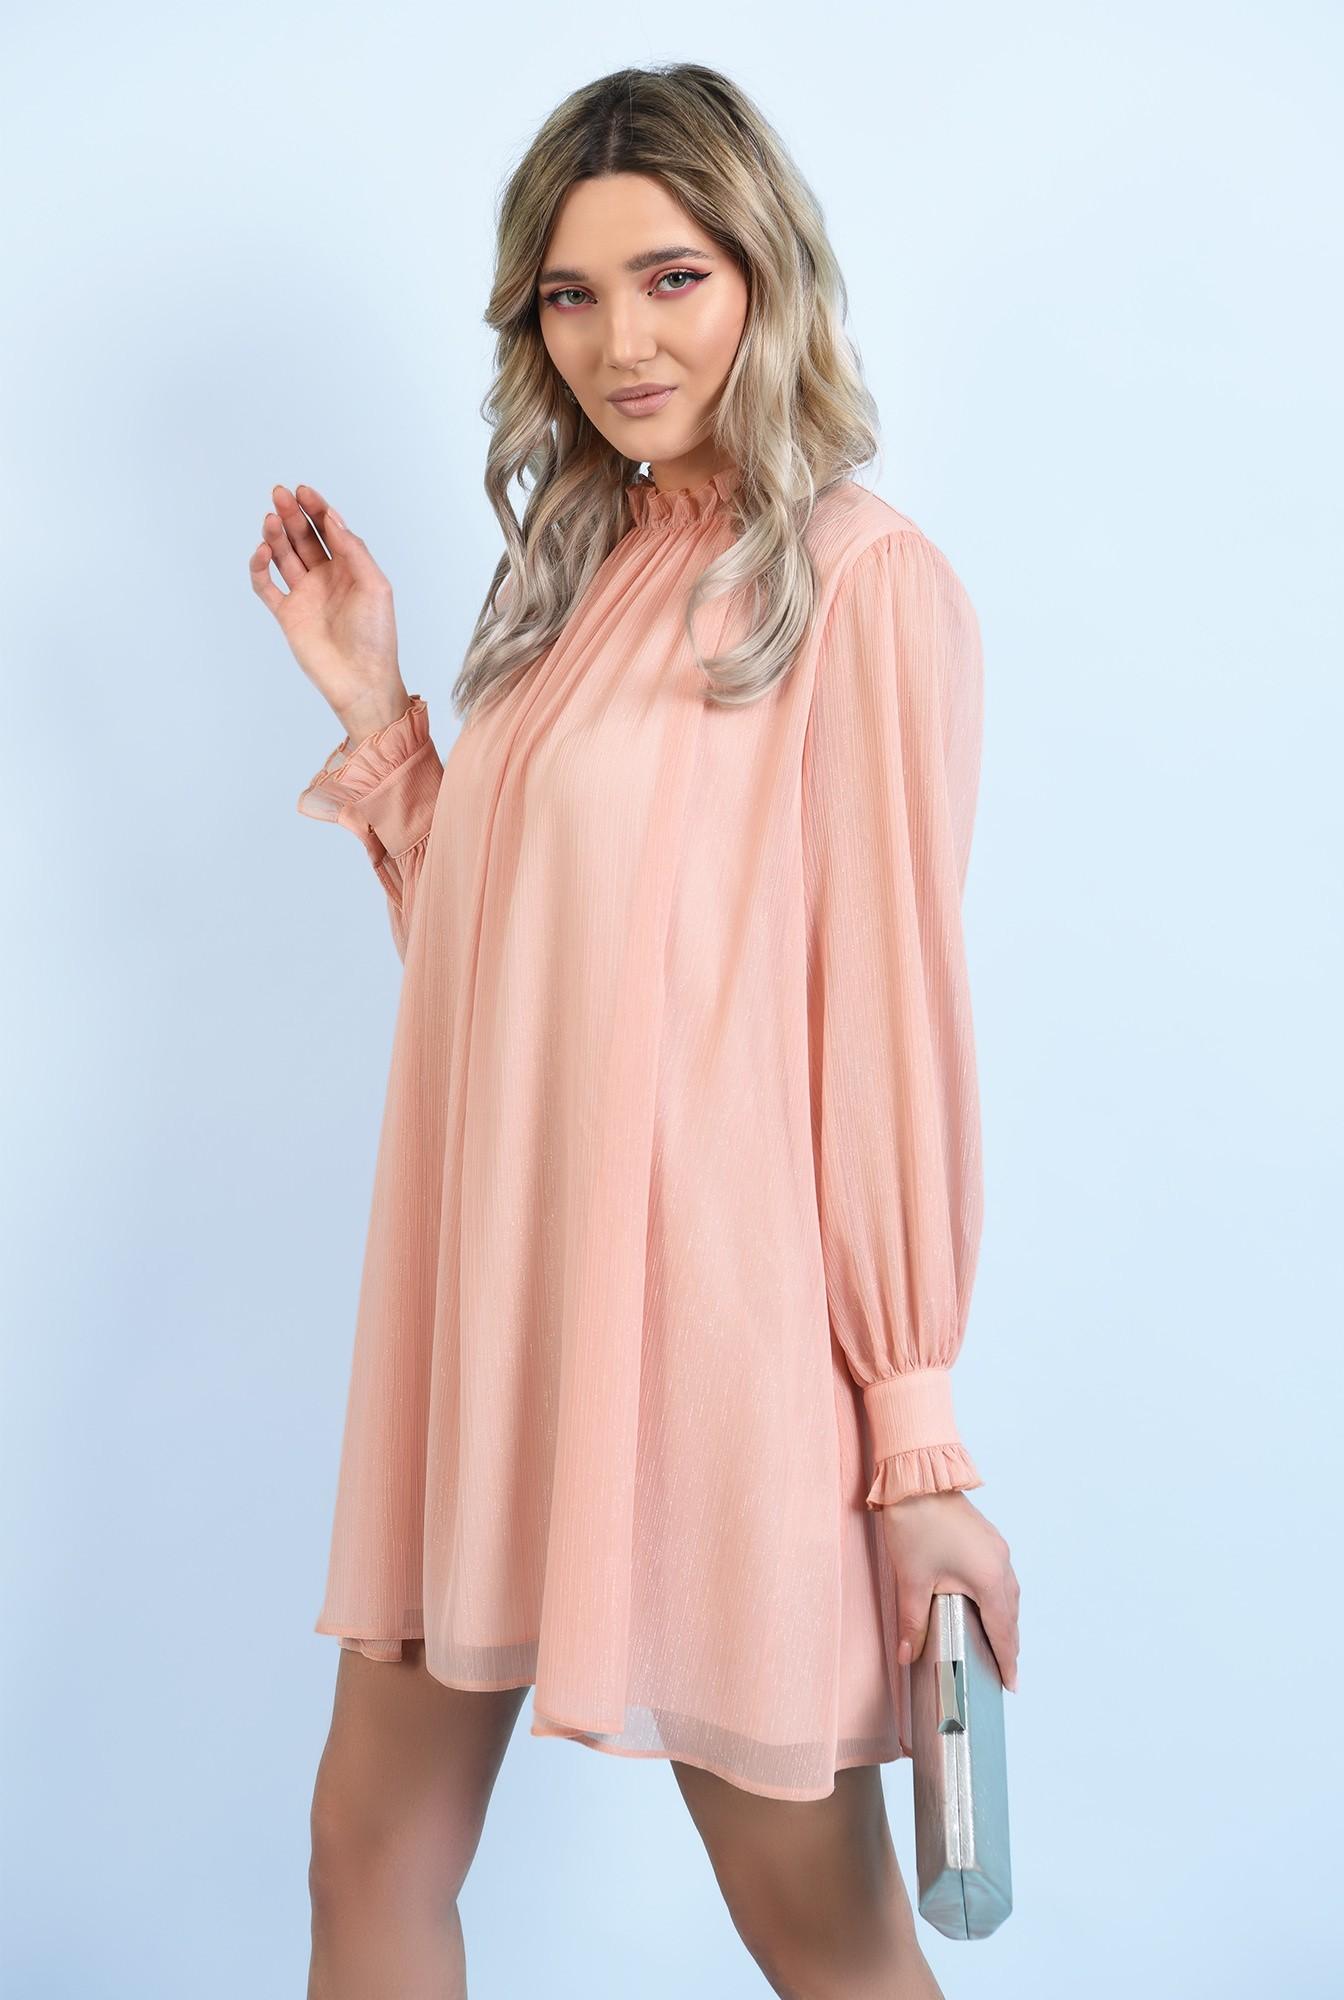 2 - 360 -  rochie scurta, eleganta, evazata, din sifon creponat, cu fir, nasture bijuterie